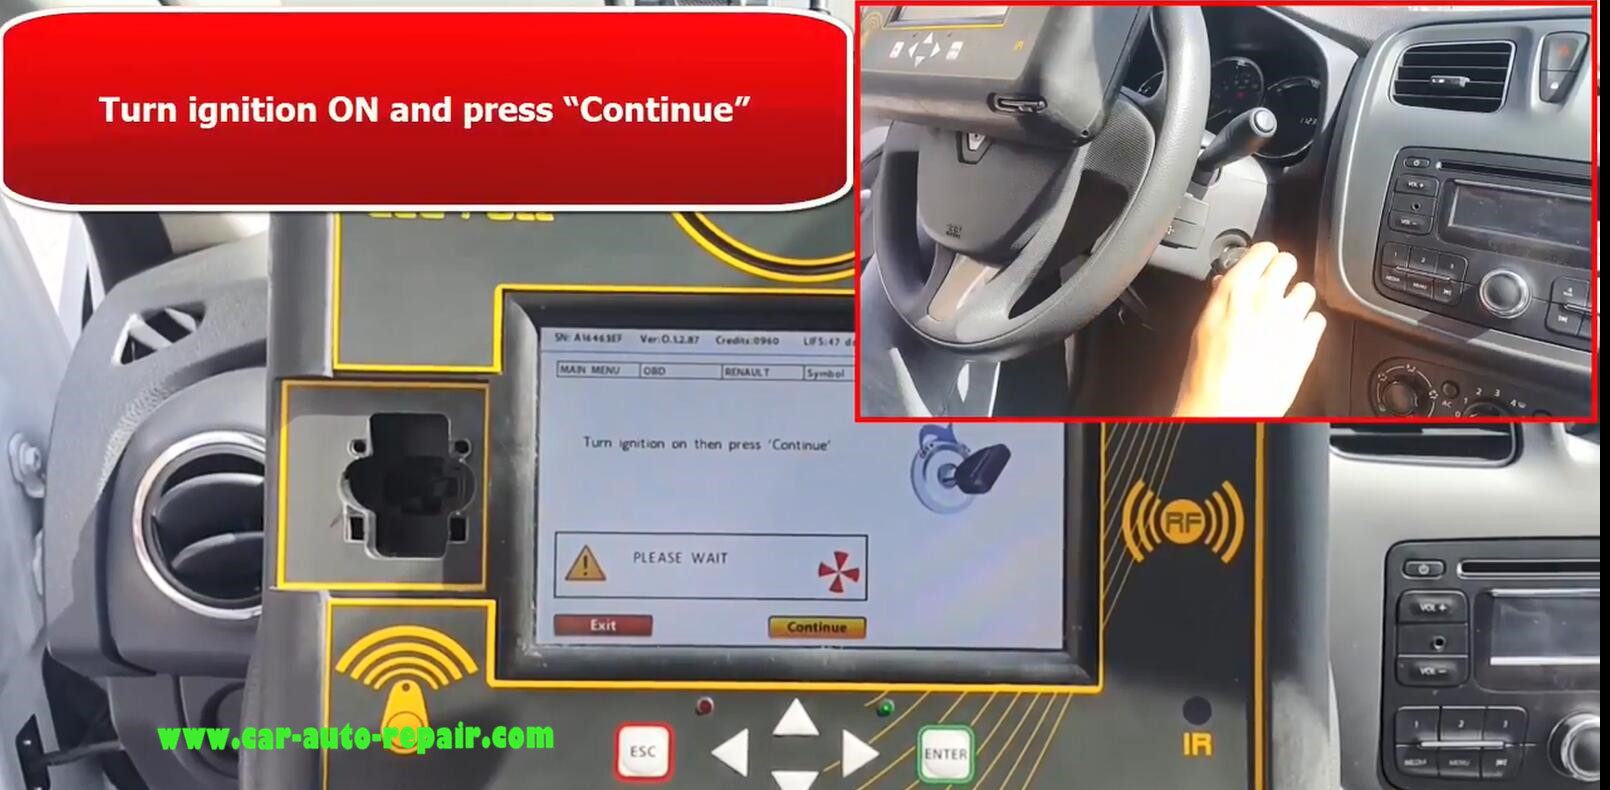 Renault SYMBOL 13+ Key Programming by Zed-Full Programmer (10)